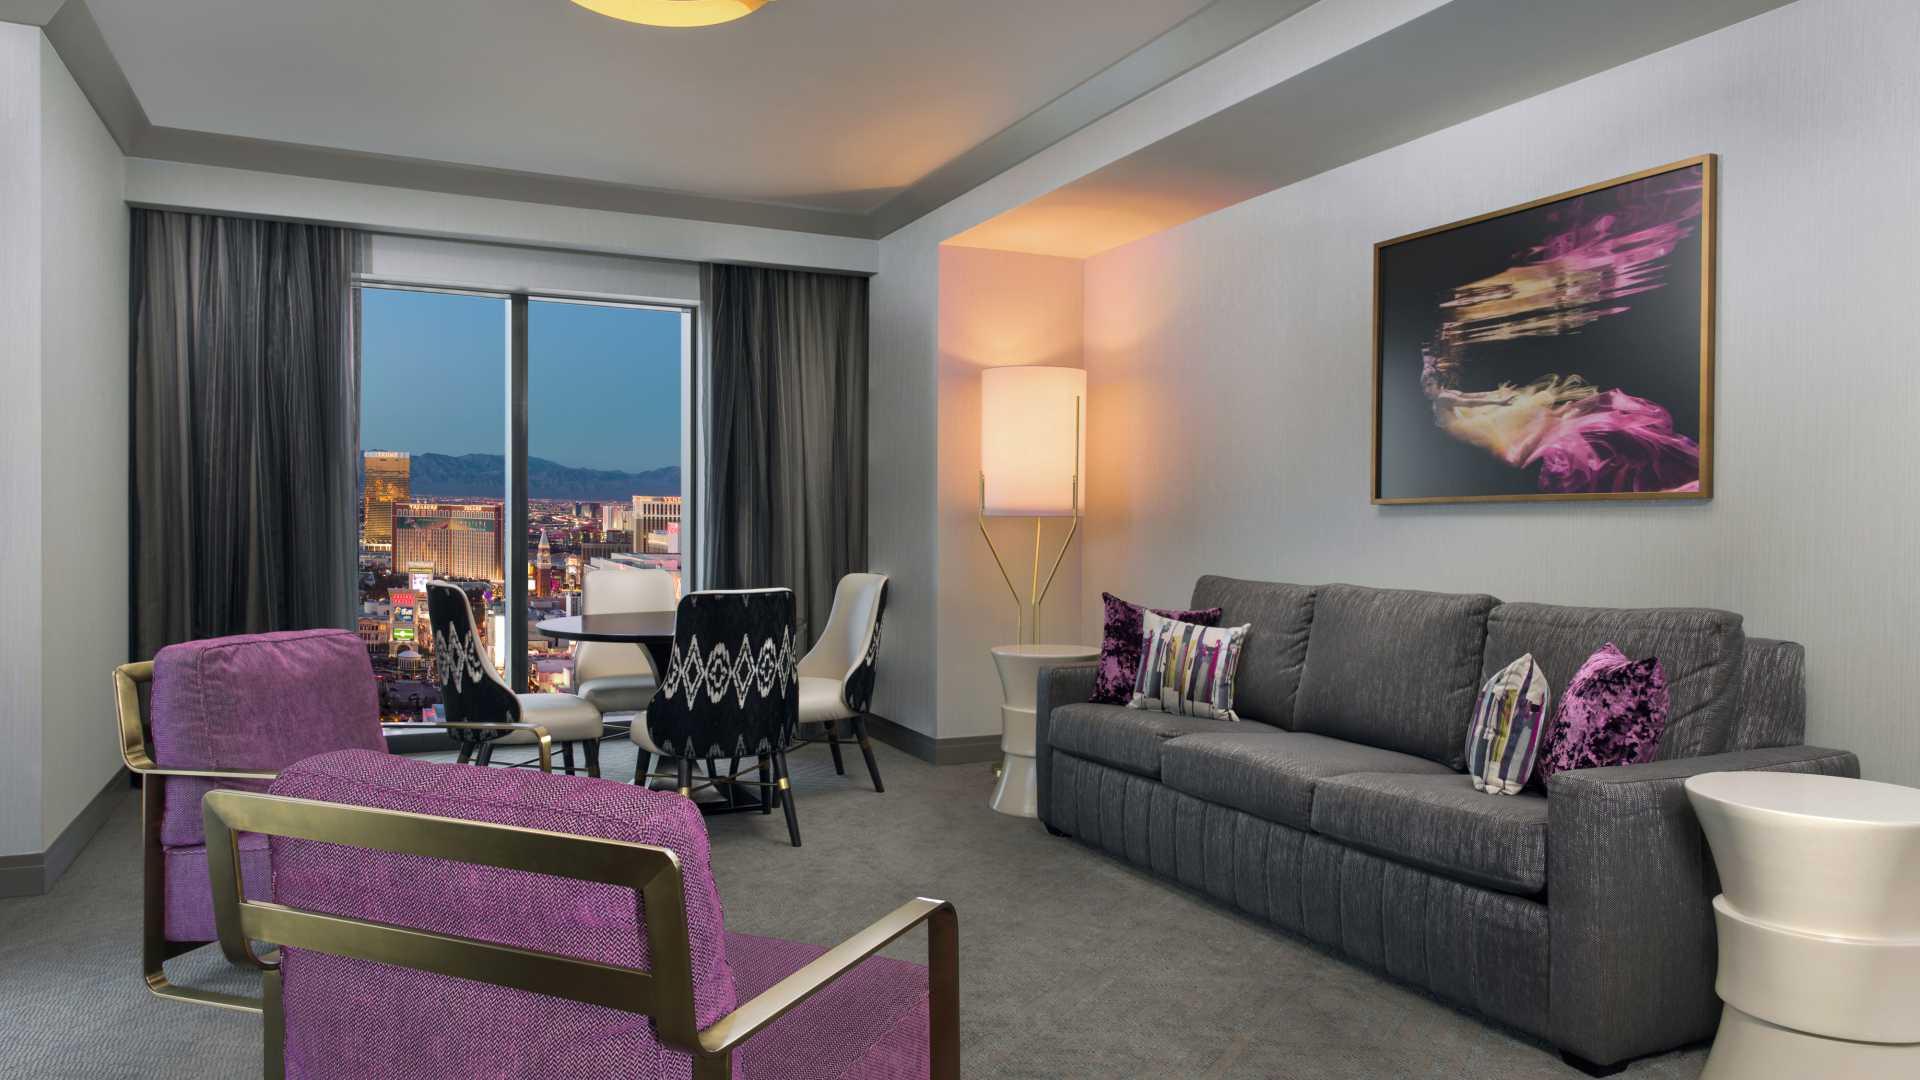 Miraculous Las Vegas Luxury Hotel Rooms And Suites The Cosmopolitan Download Free Architecture Designs Scobabritishbridgeorg